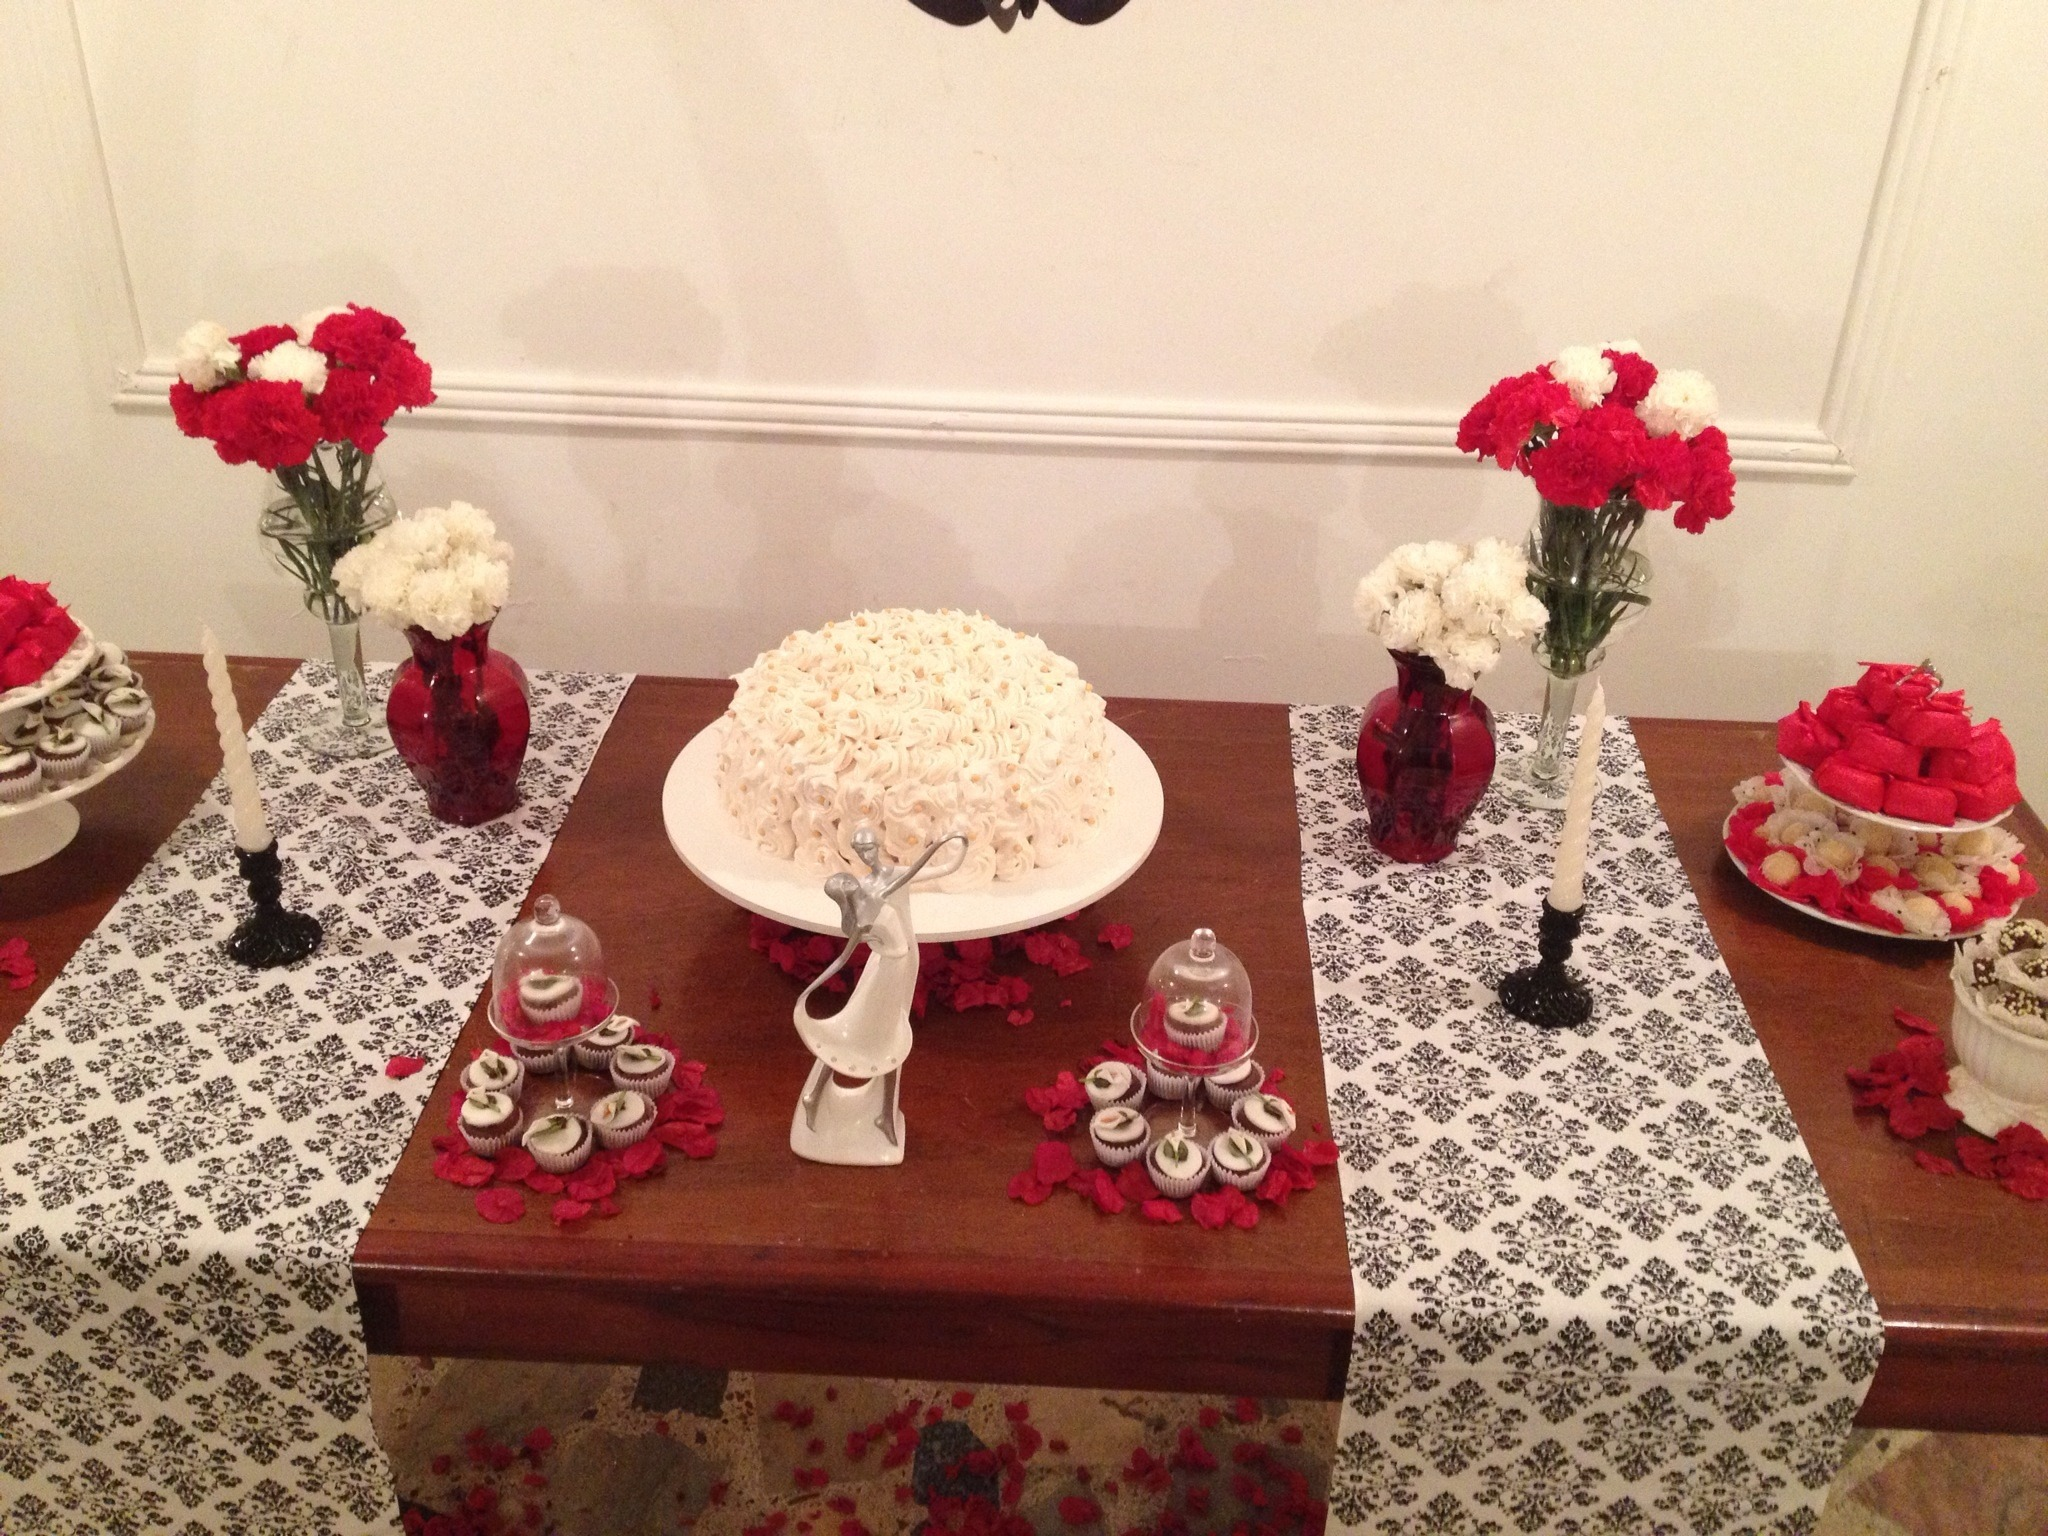 decoracao festa noivado:decoracao noivado decoracao noivado decoracao noivado